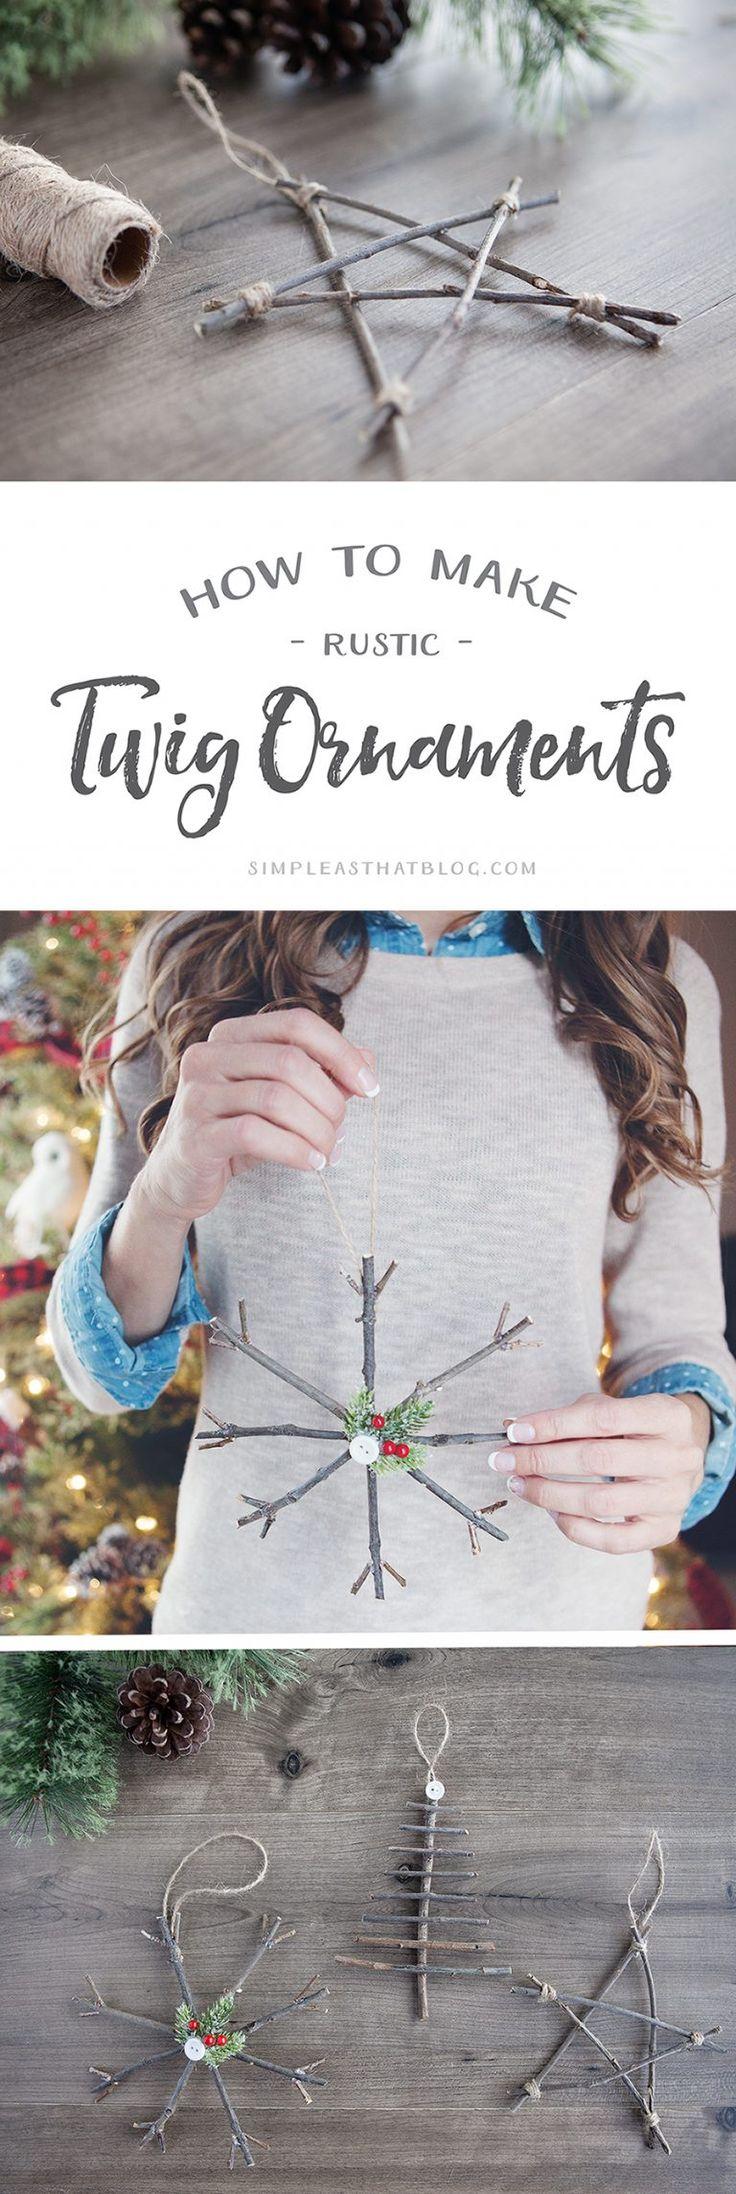 DIY Project: MAKE RUSTIC TWIG CHRISTMAS ORNAMENTS